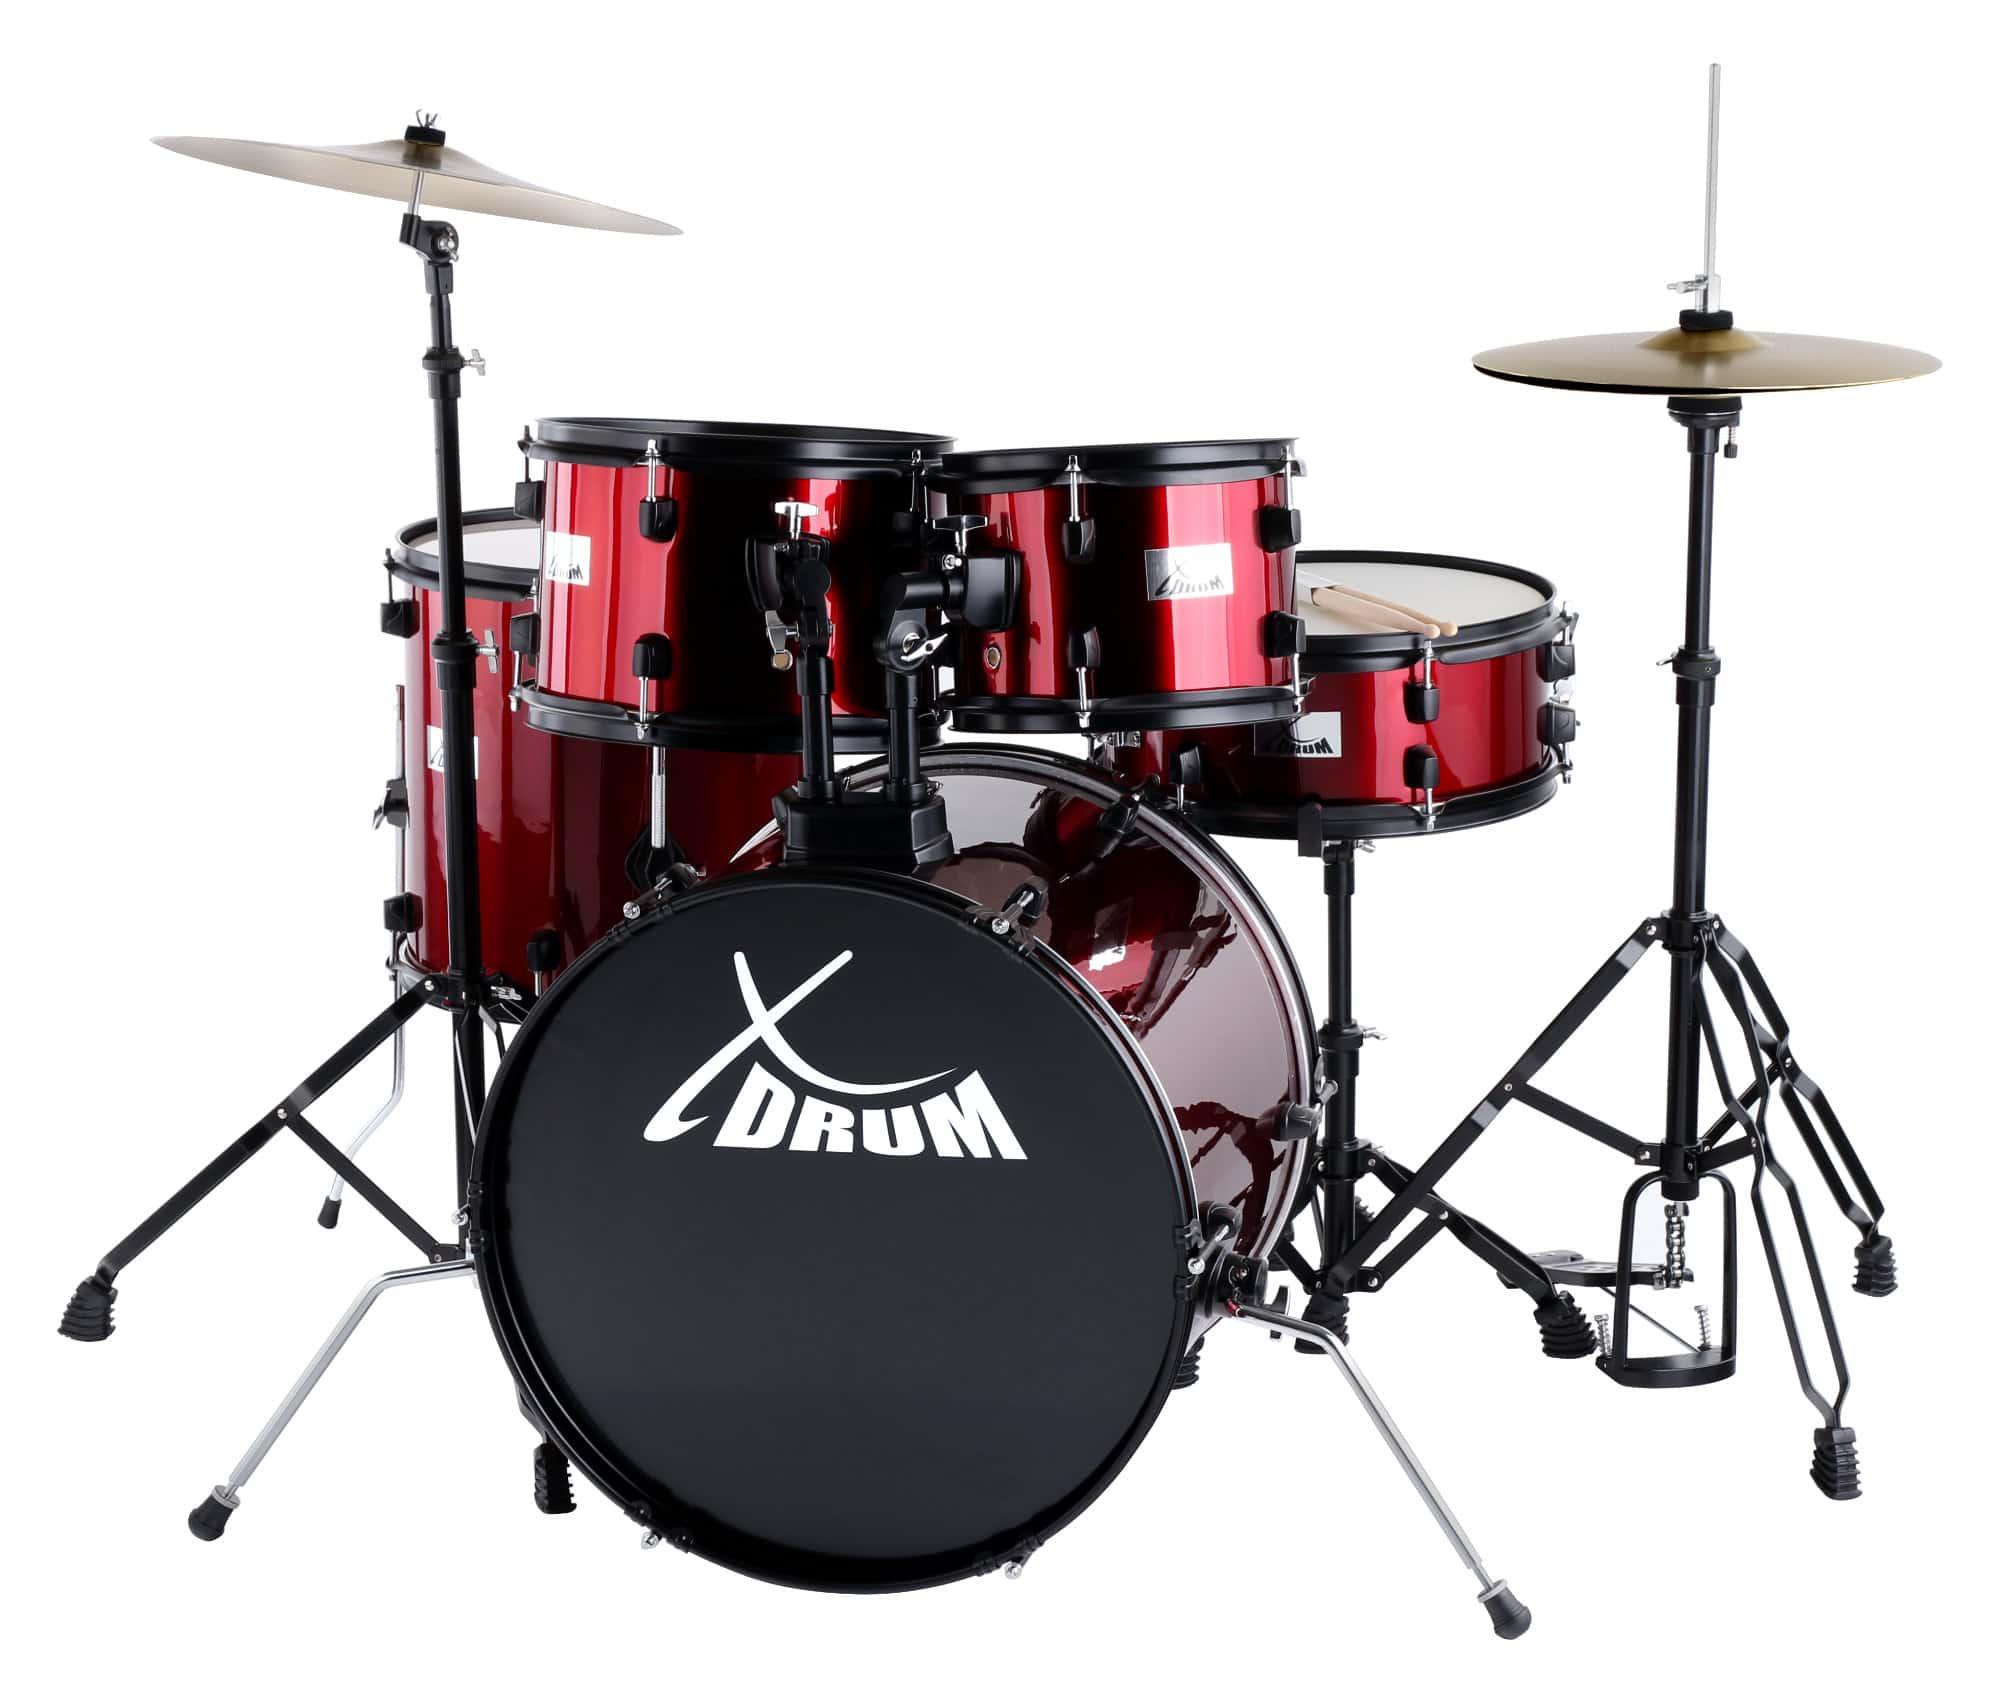 XDrum Rookie 20' Studio Schlagzeug Komplettset Ruby Red inkl. Schule DVD